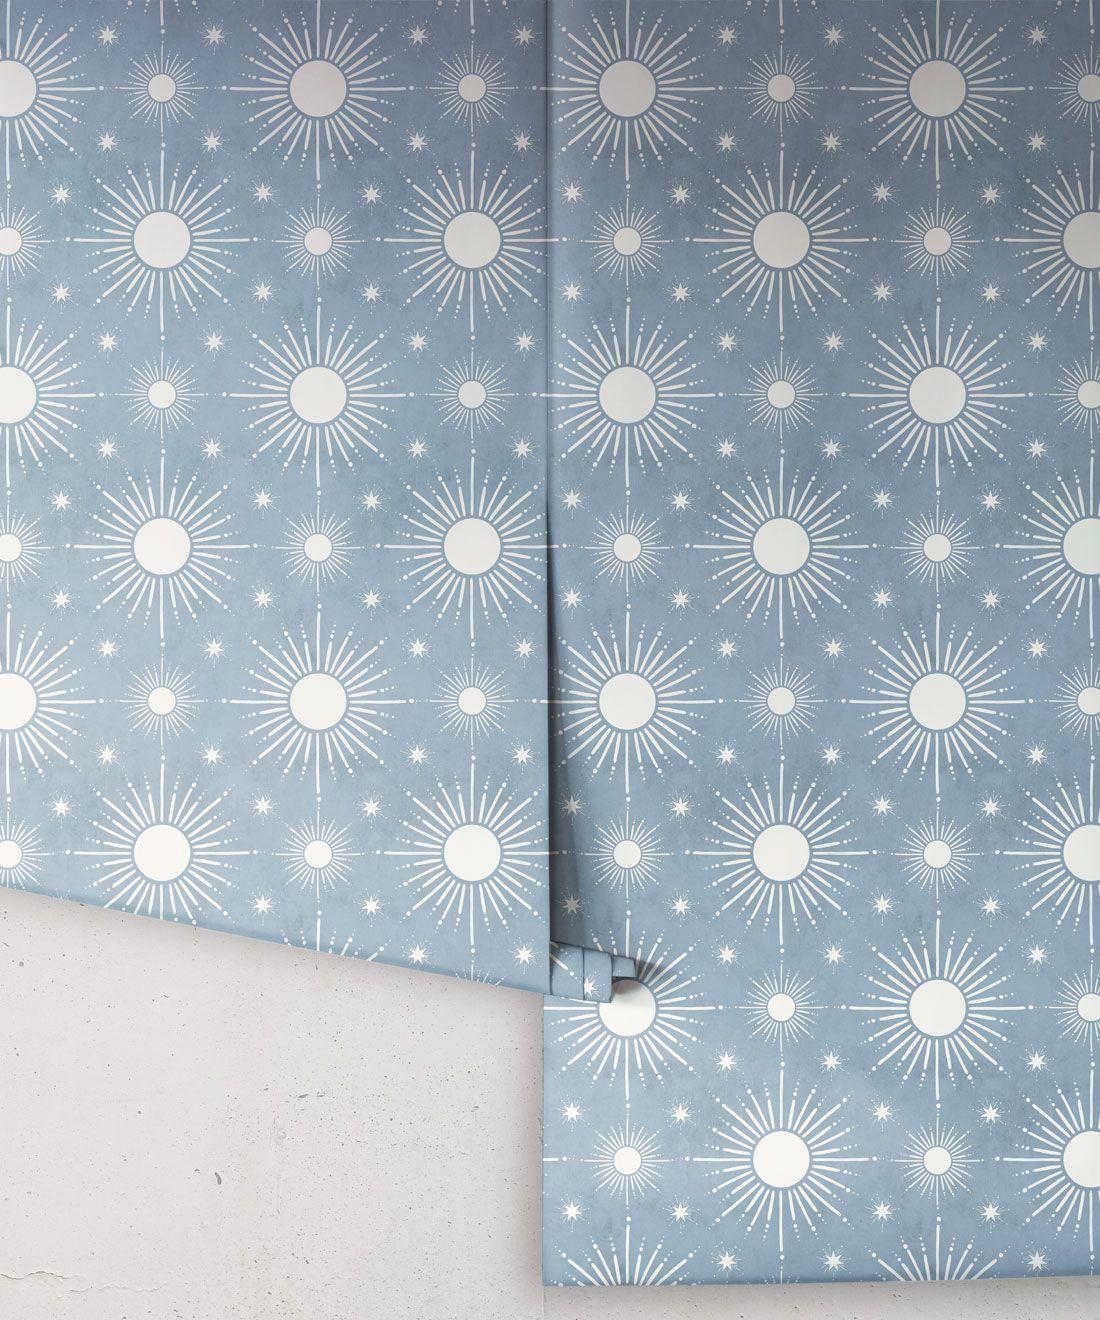 Sun Light Star Bright Wallpaper • French Blue• Rolls